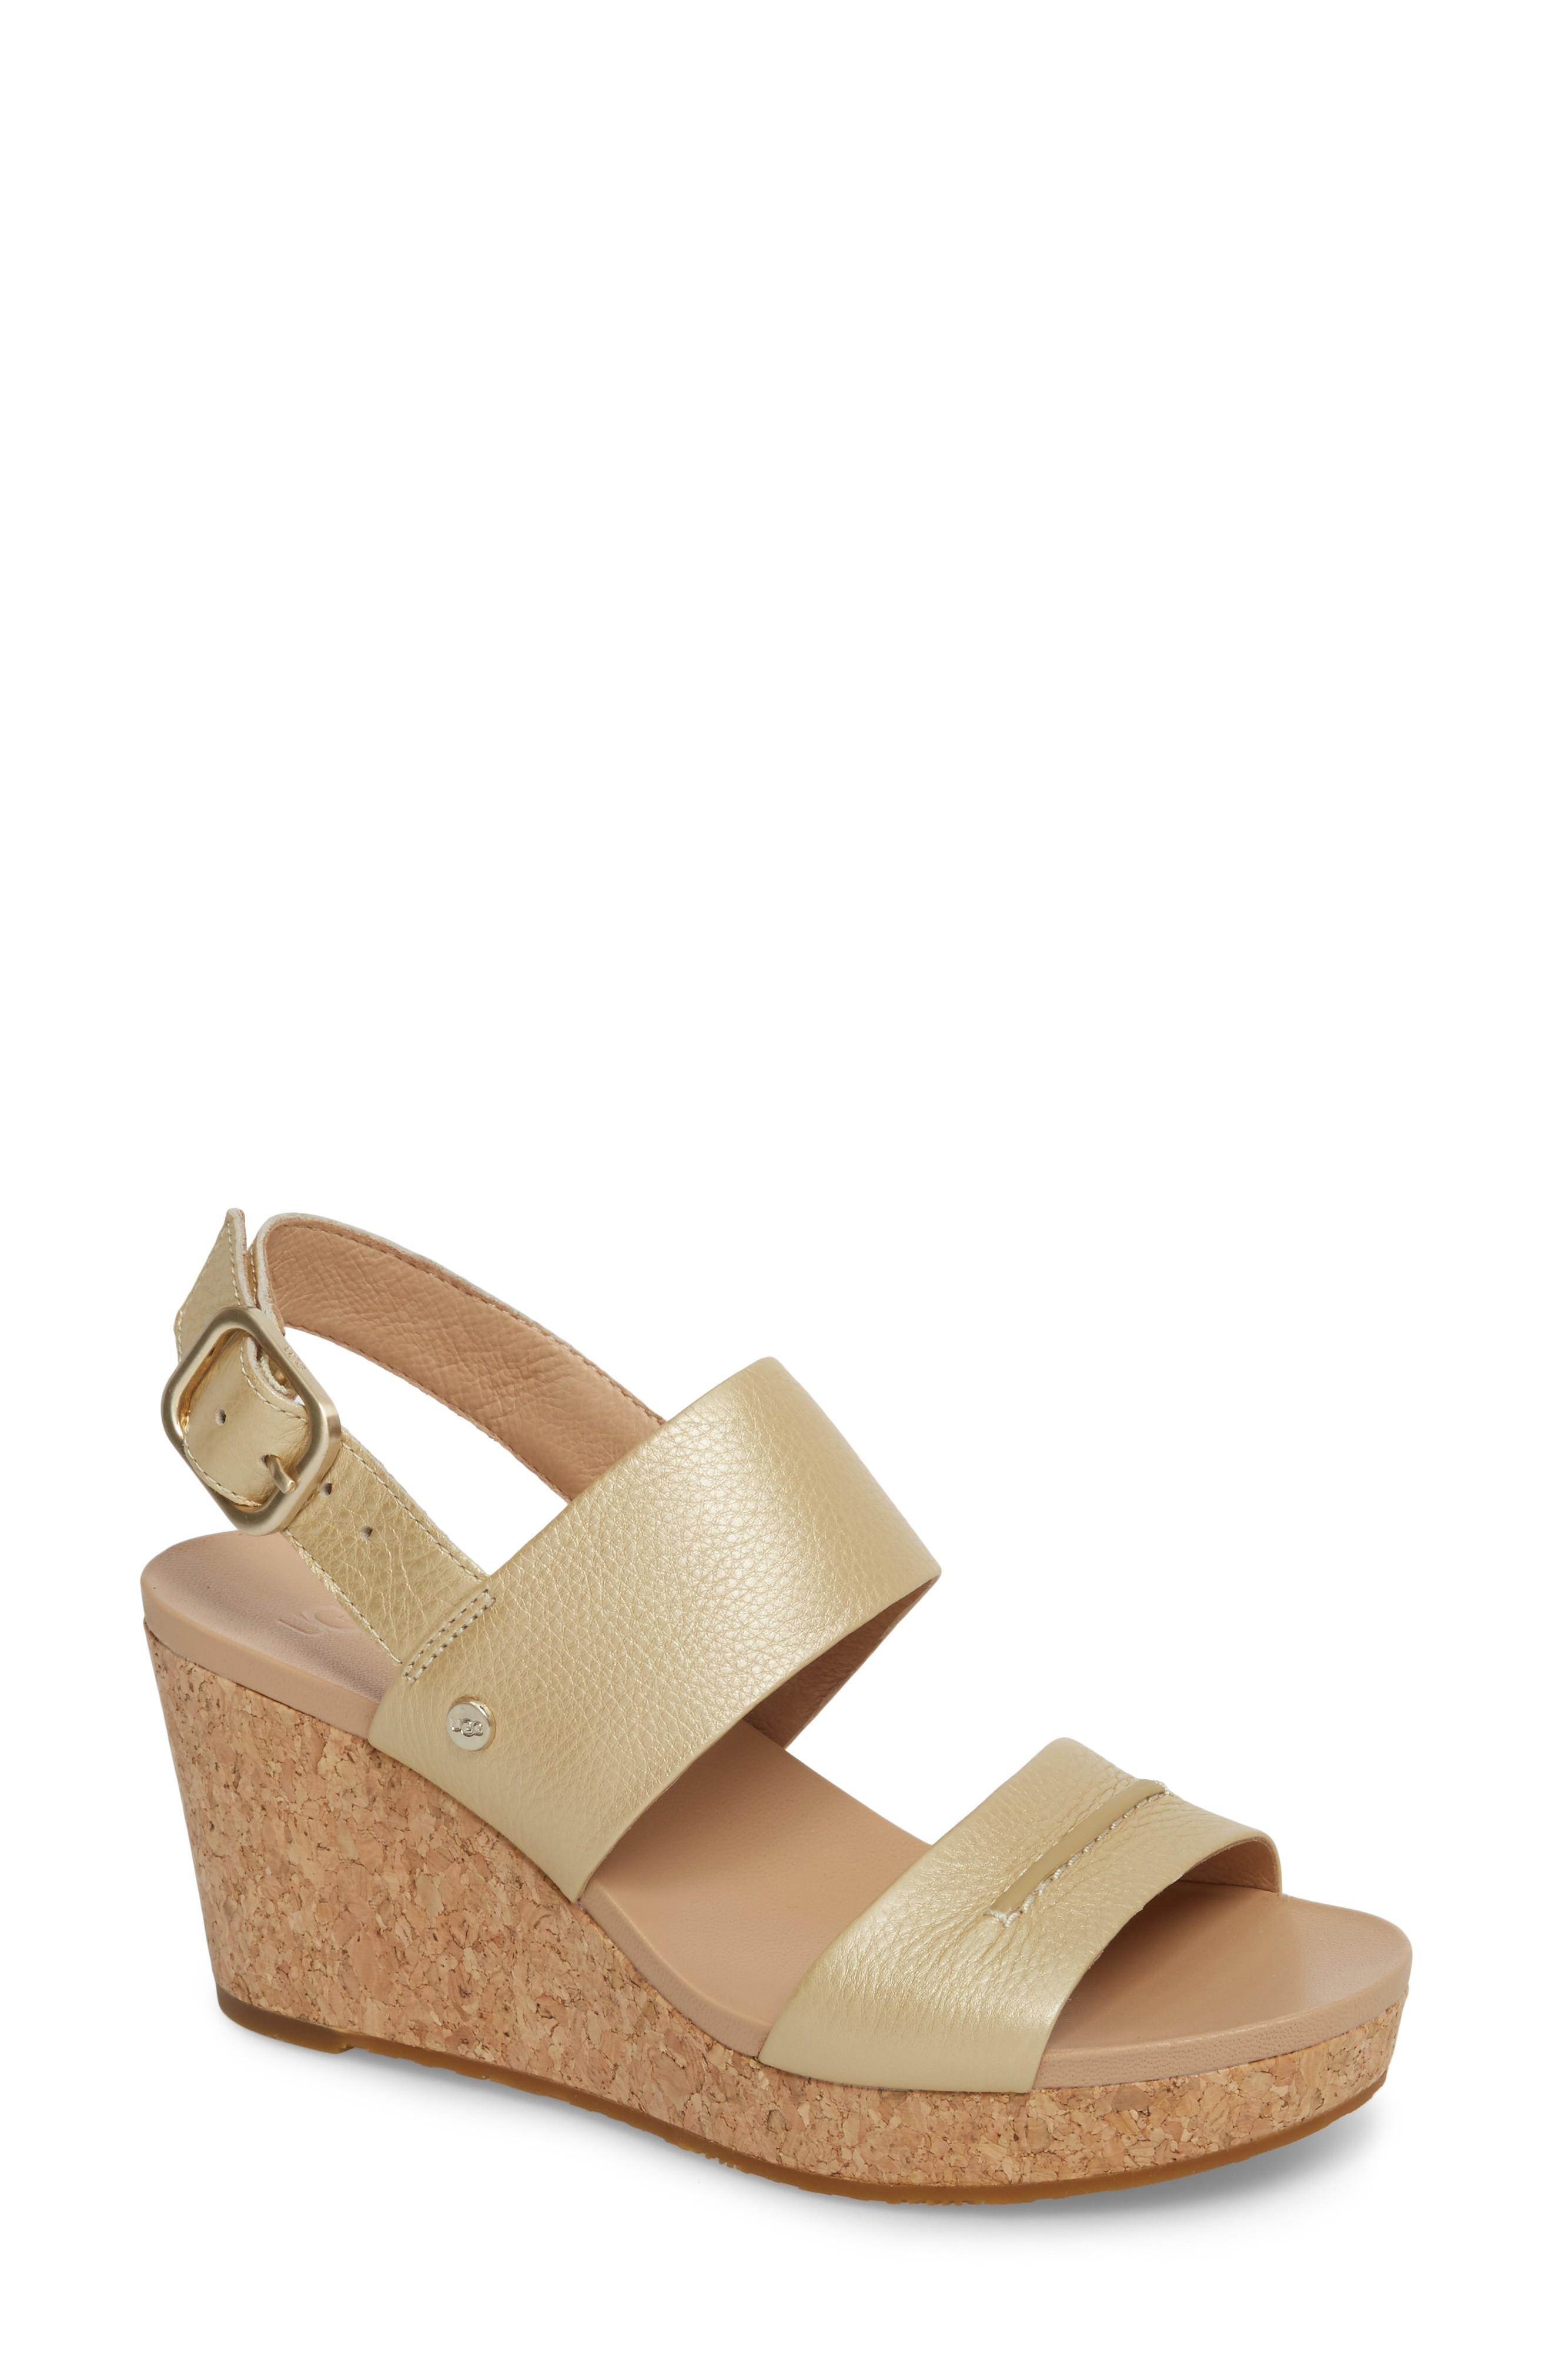 23e5e6cabc2 Ugg Elena Ii Metallic Platform Wedge Sandal in Soft Gold